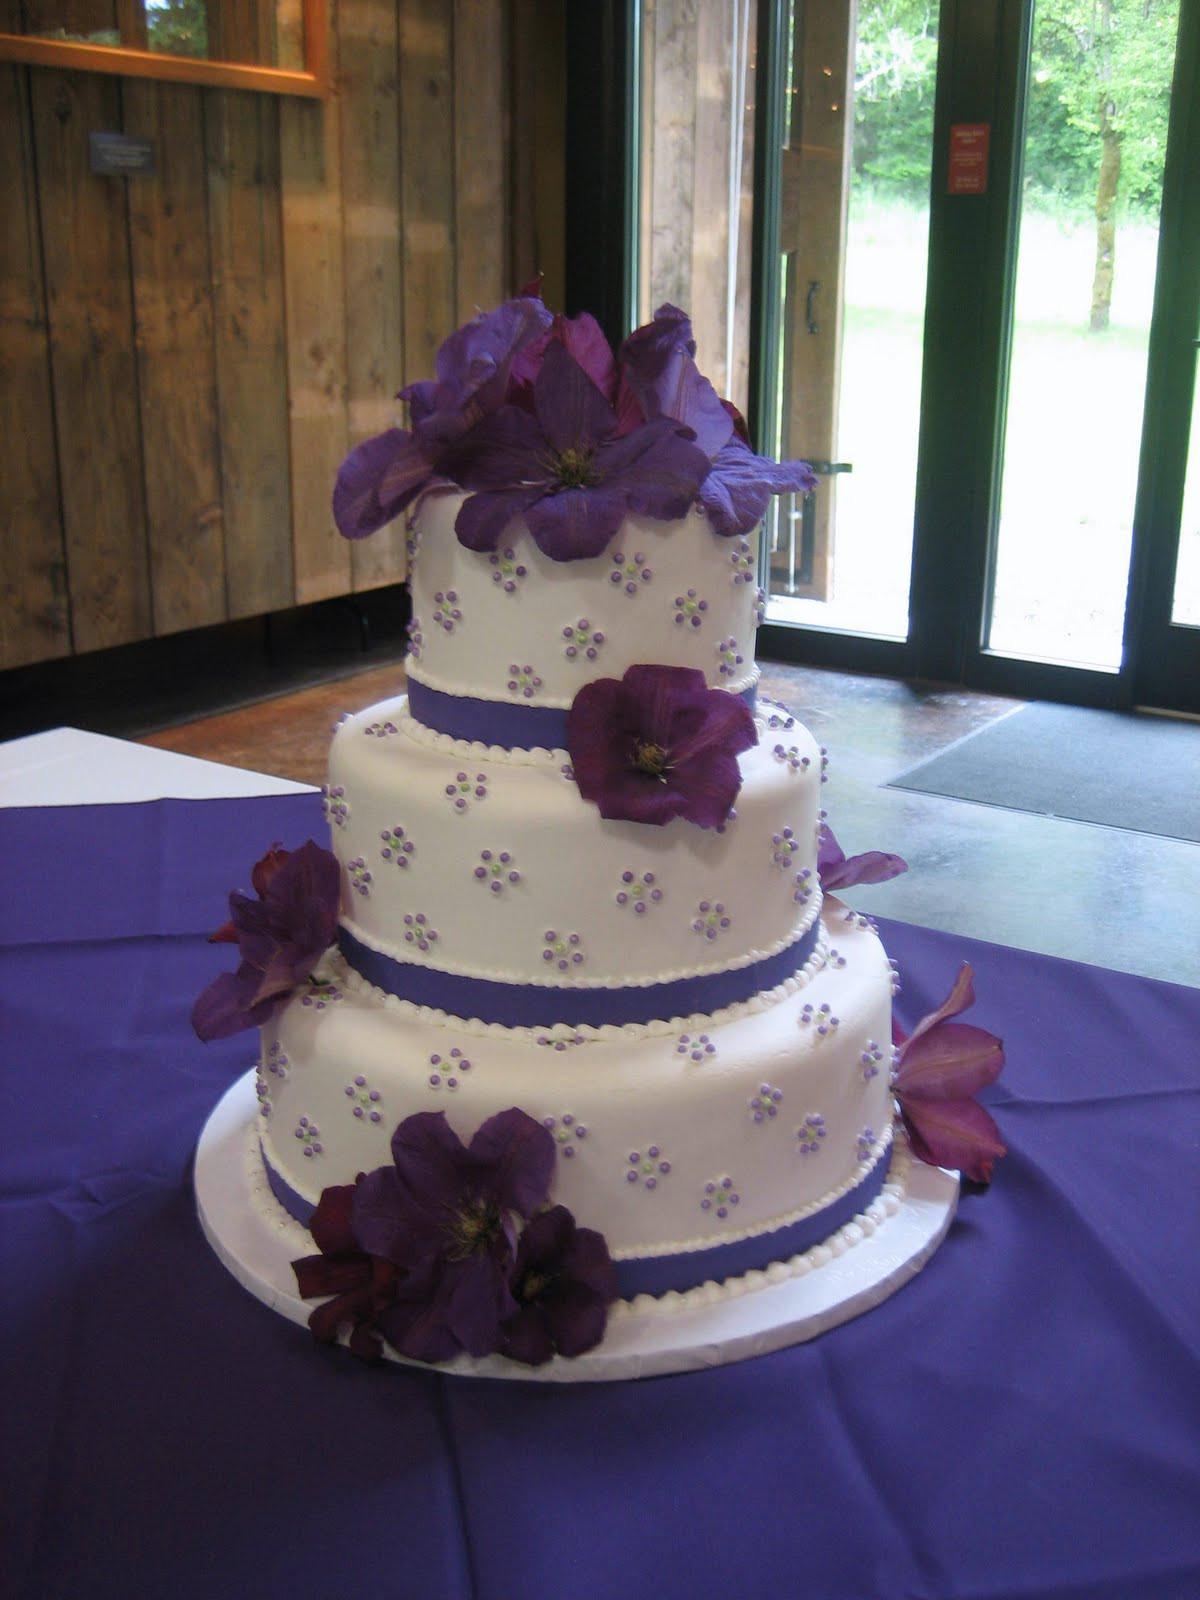 Wedding Cakes With Purple Flowers  Jillicious Discoveries Three Purple Wedding Cakes